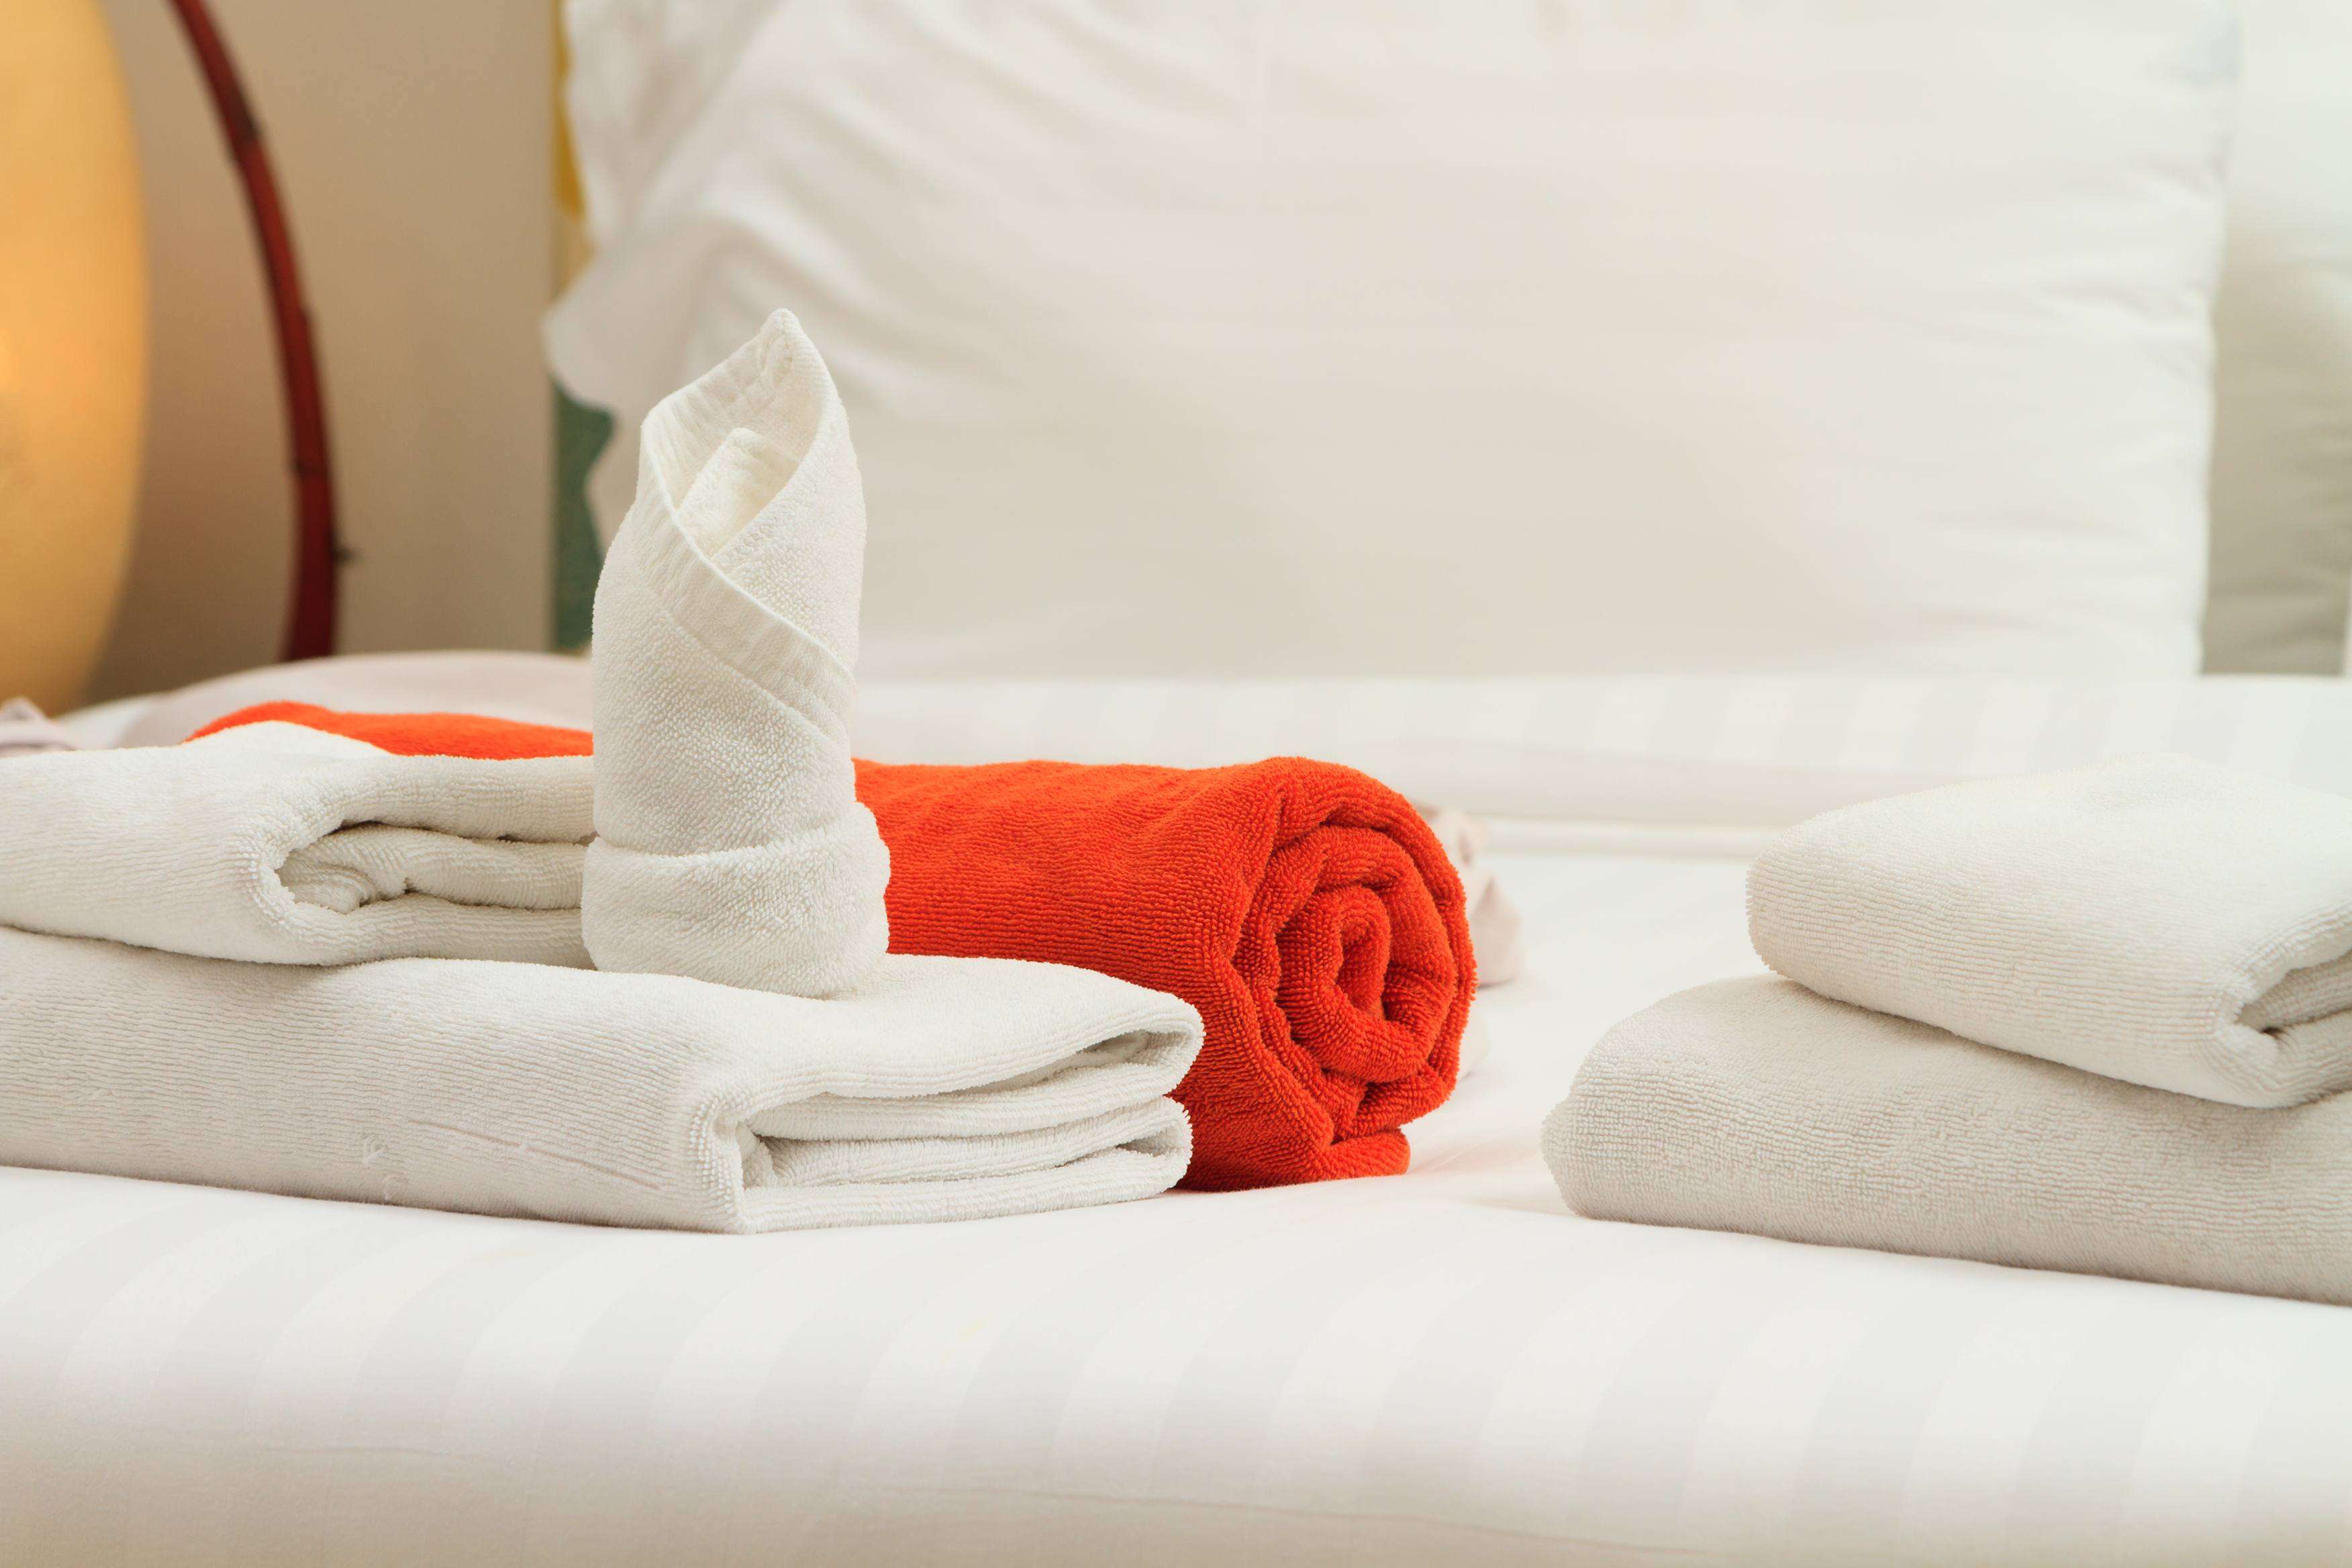 Luxury hotel towels.